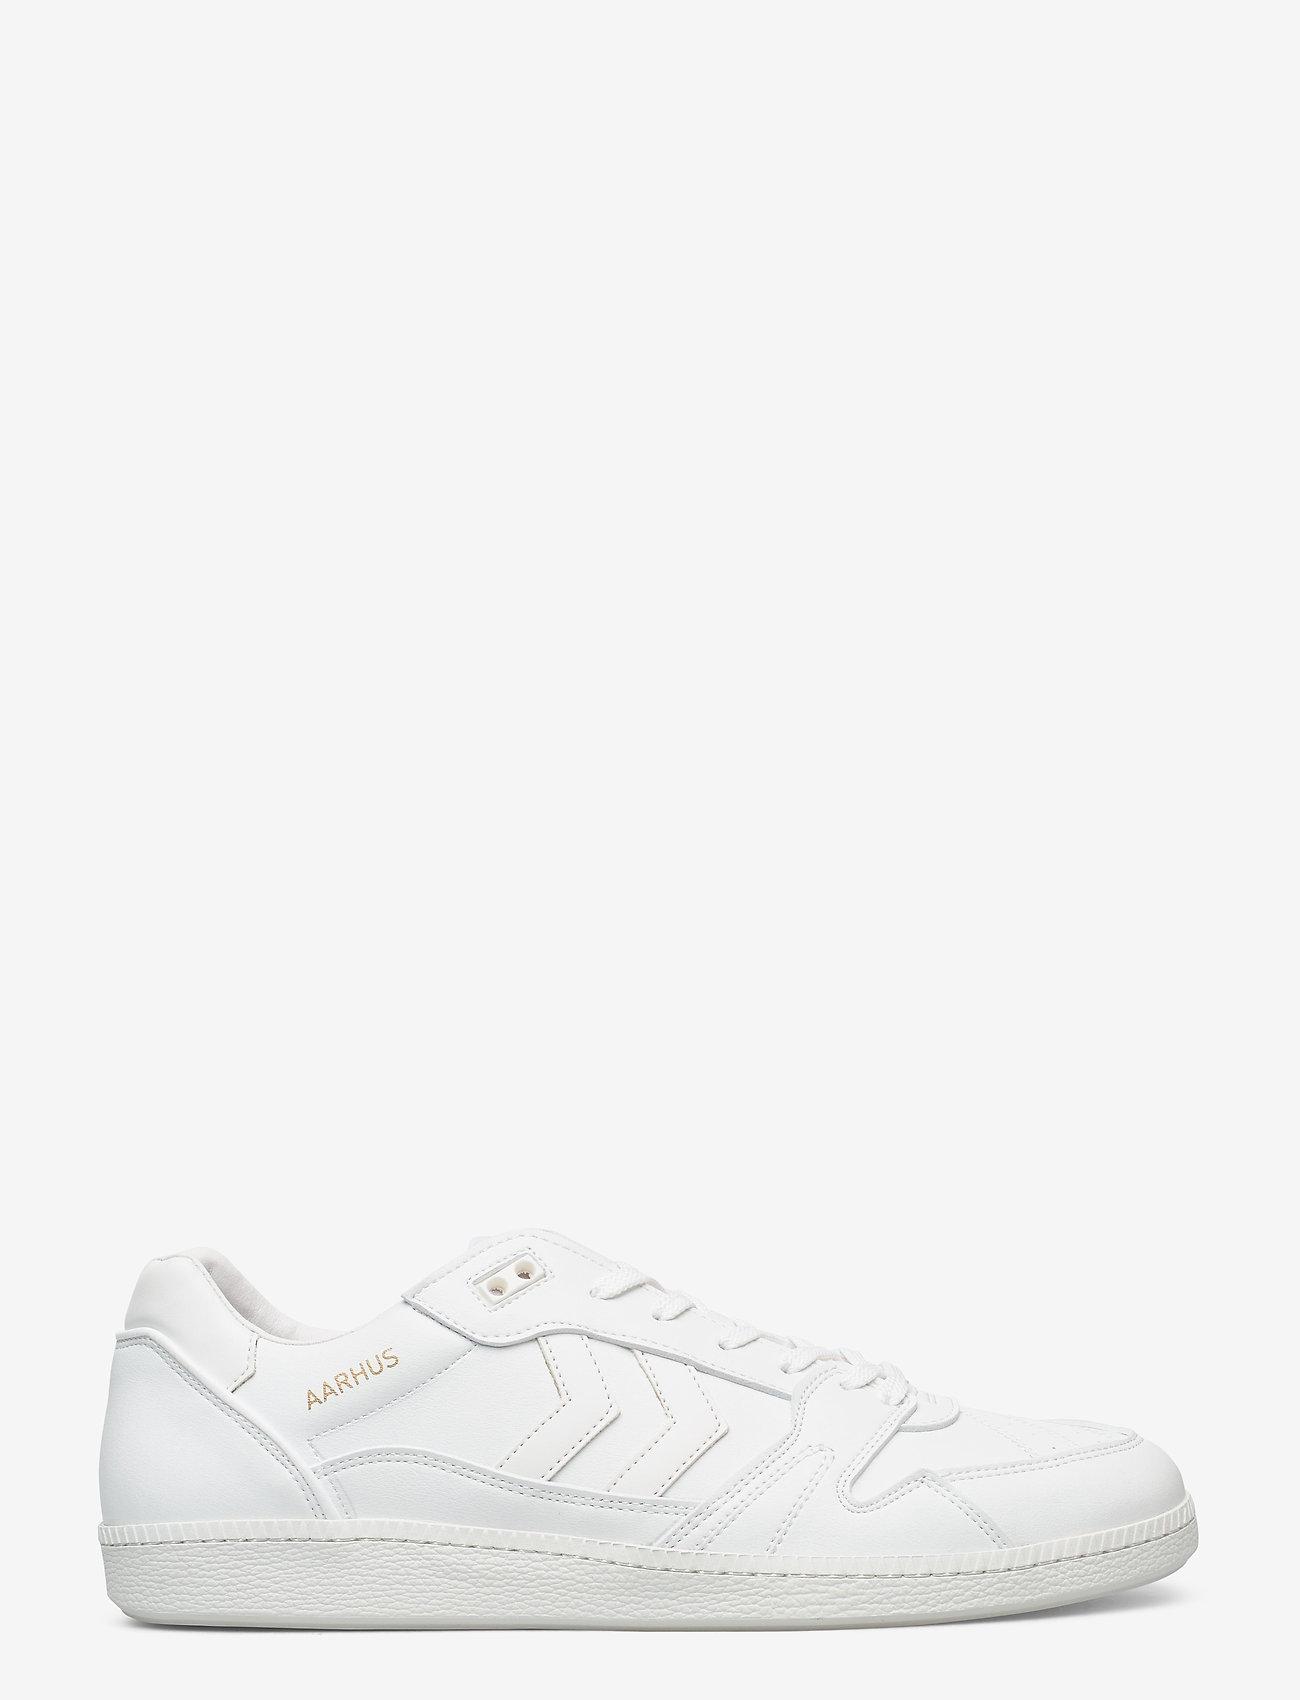 Hummel - HB TEAM VEGAN ARCHIVE - laag sneakers - white - 1